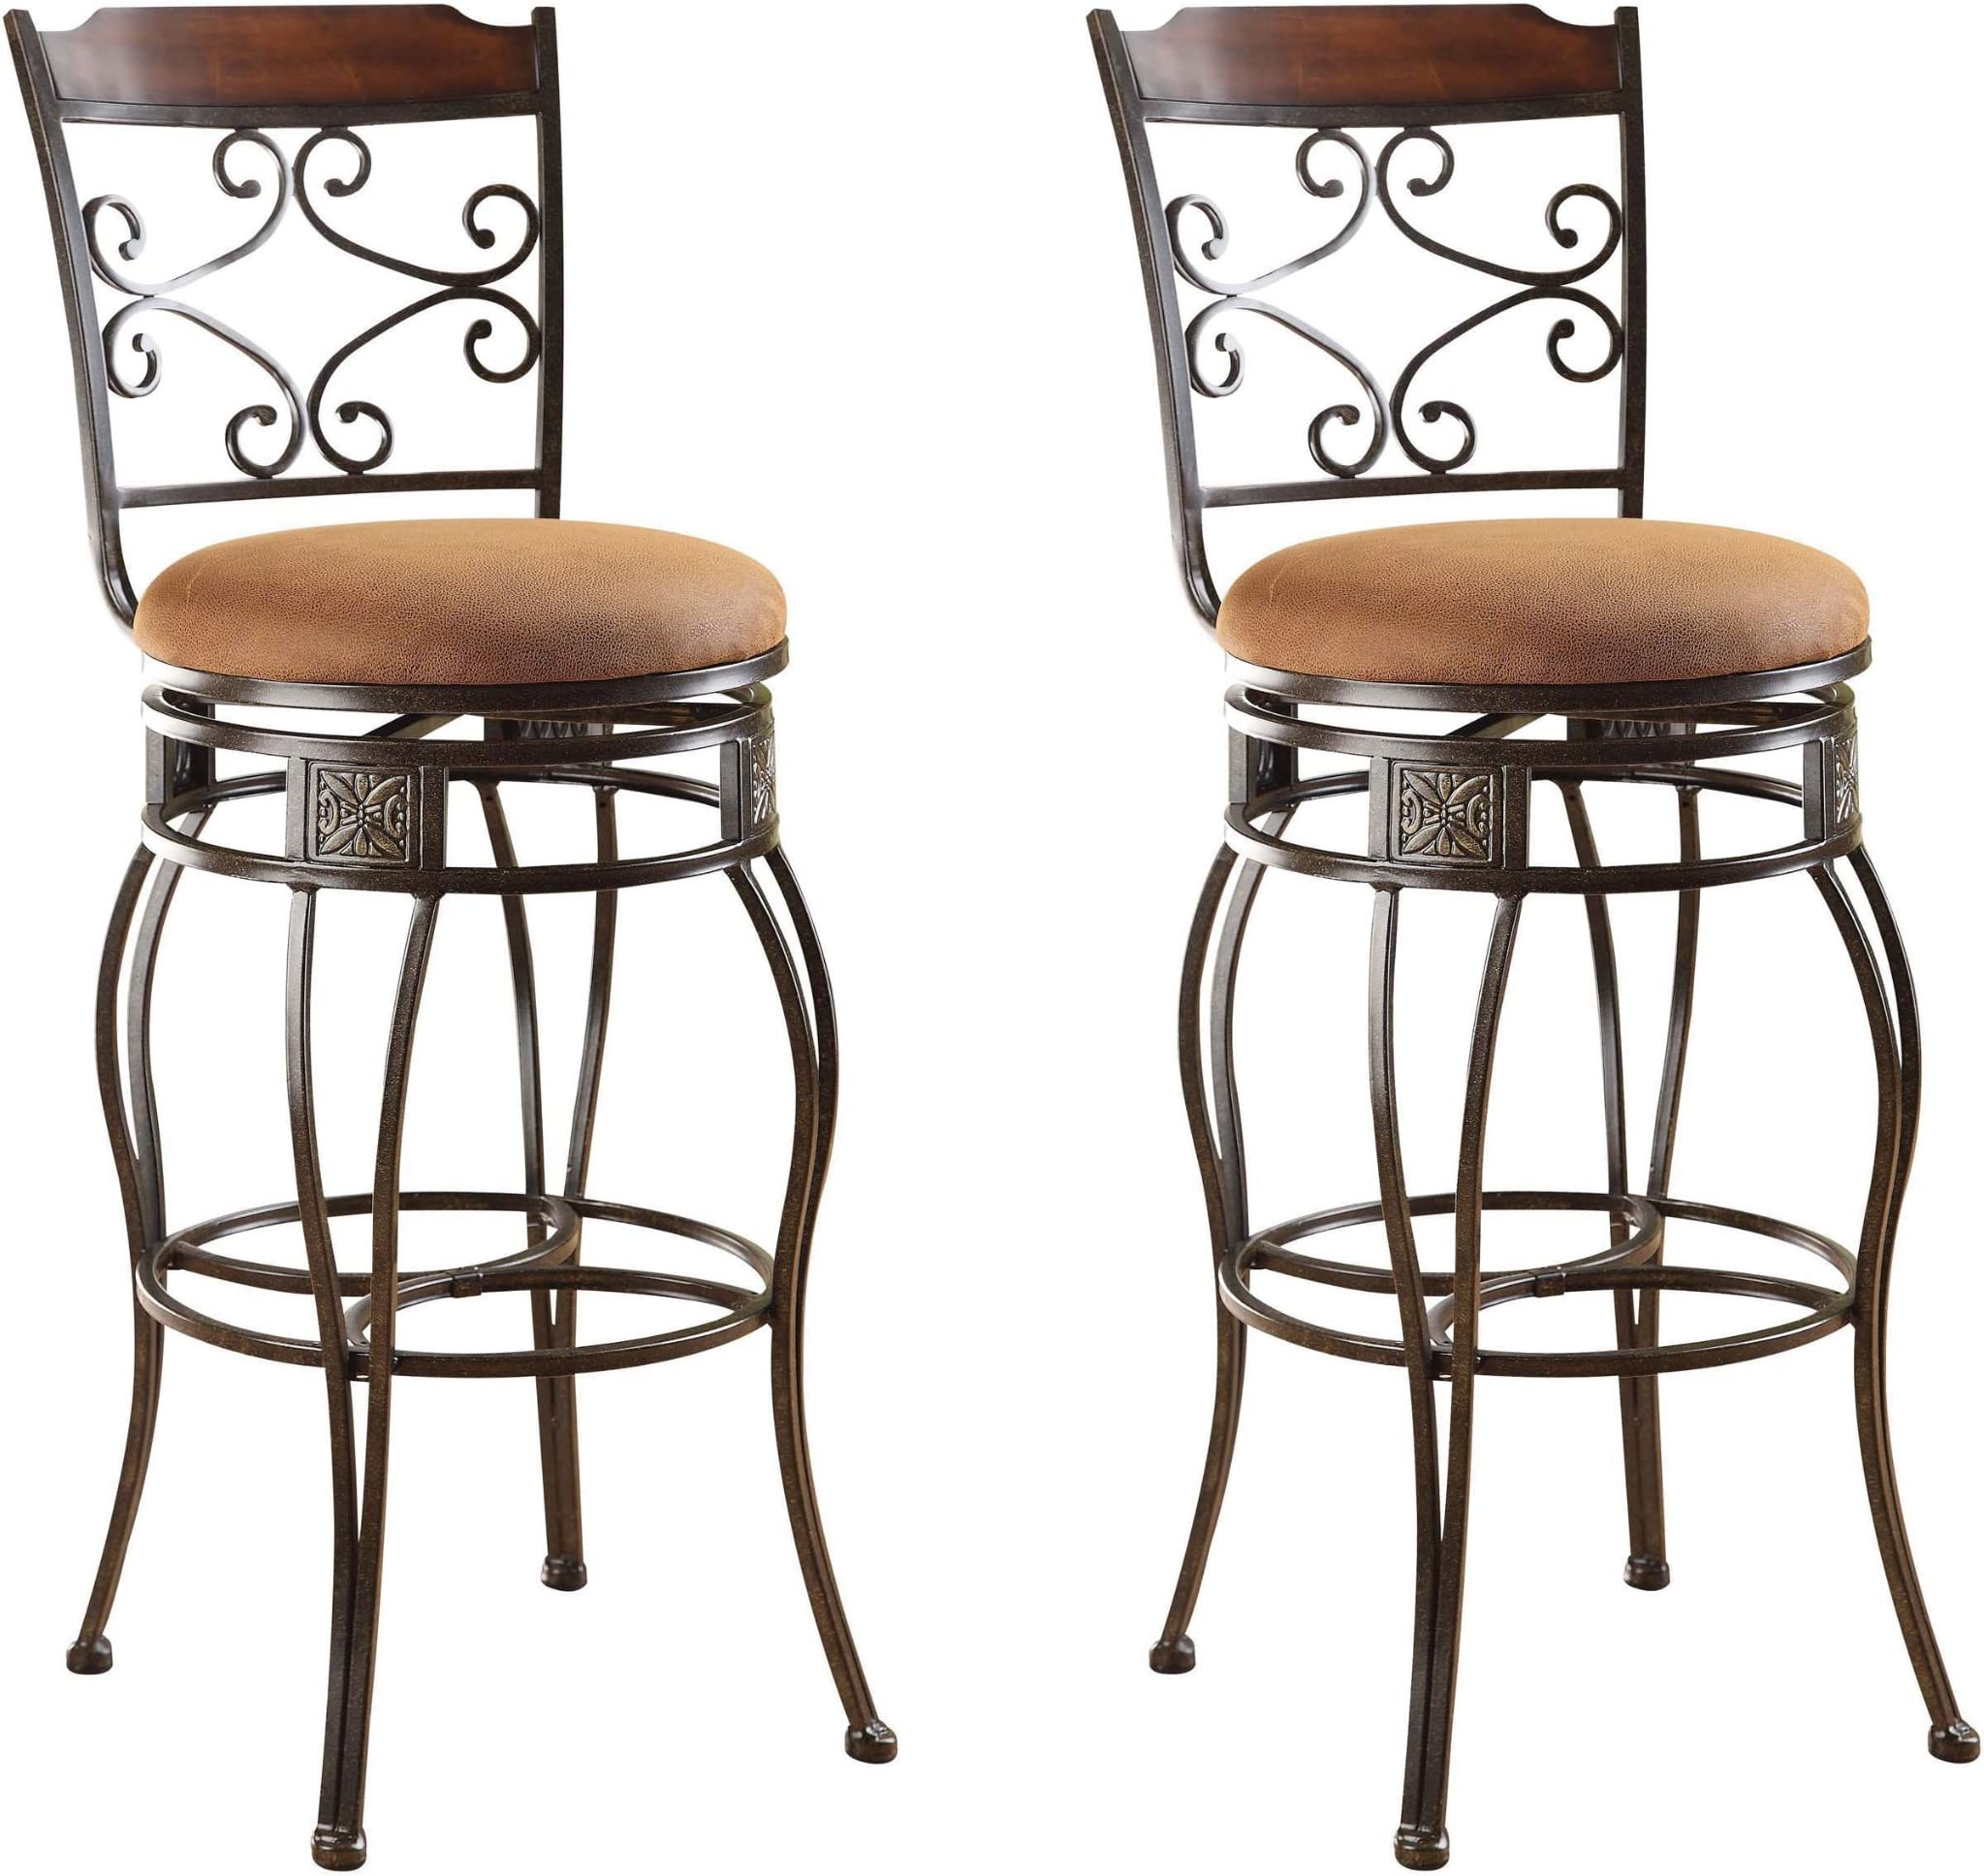 ACME 96045 Set of 2 Tavio Swivel Bar Chair 29-Inch  sc 1 st  Amazon.com & Bar Stools | Amazon.com islam-shia.org